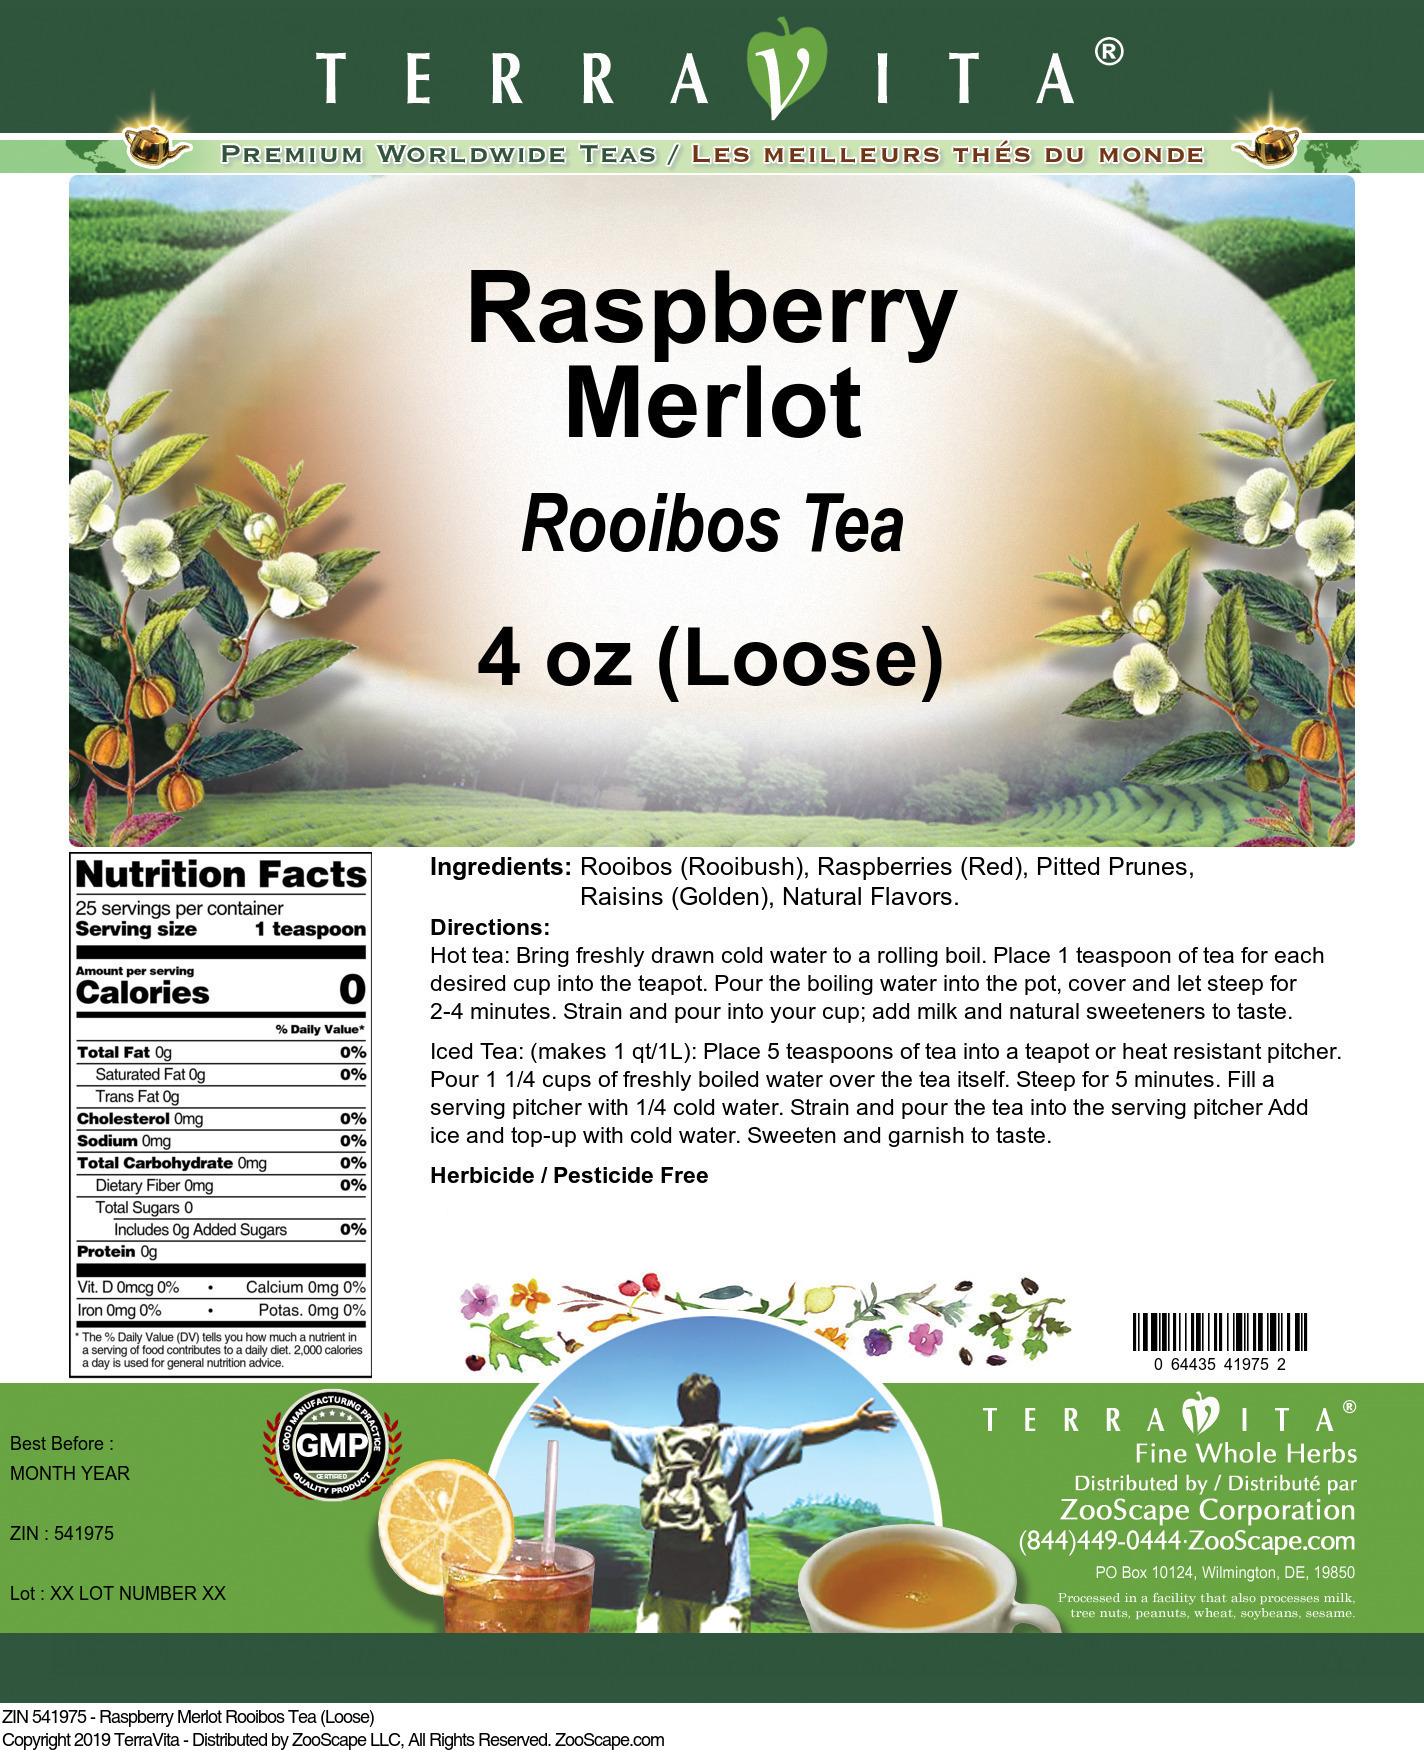 Raspberry Merlot Rooibos Tea